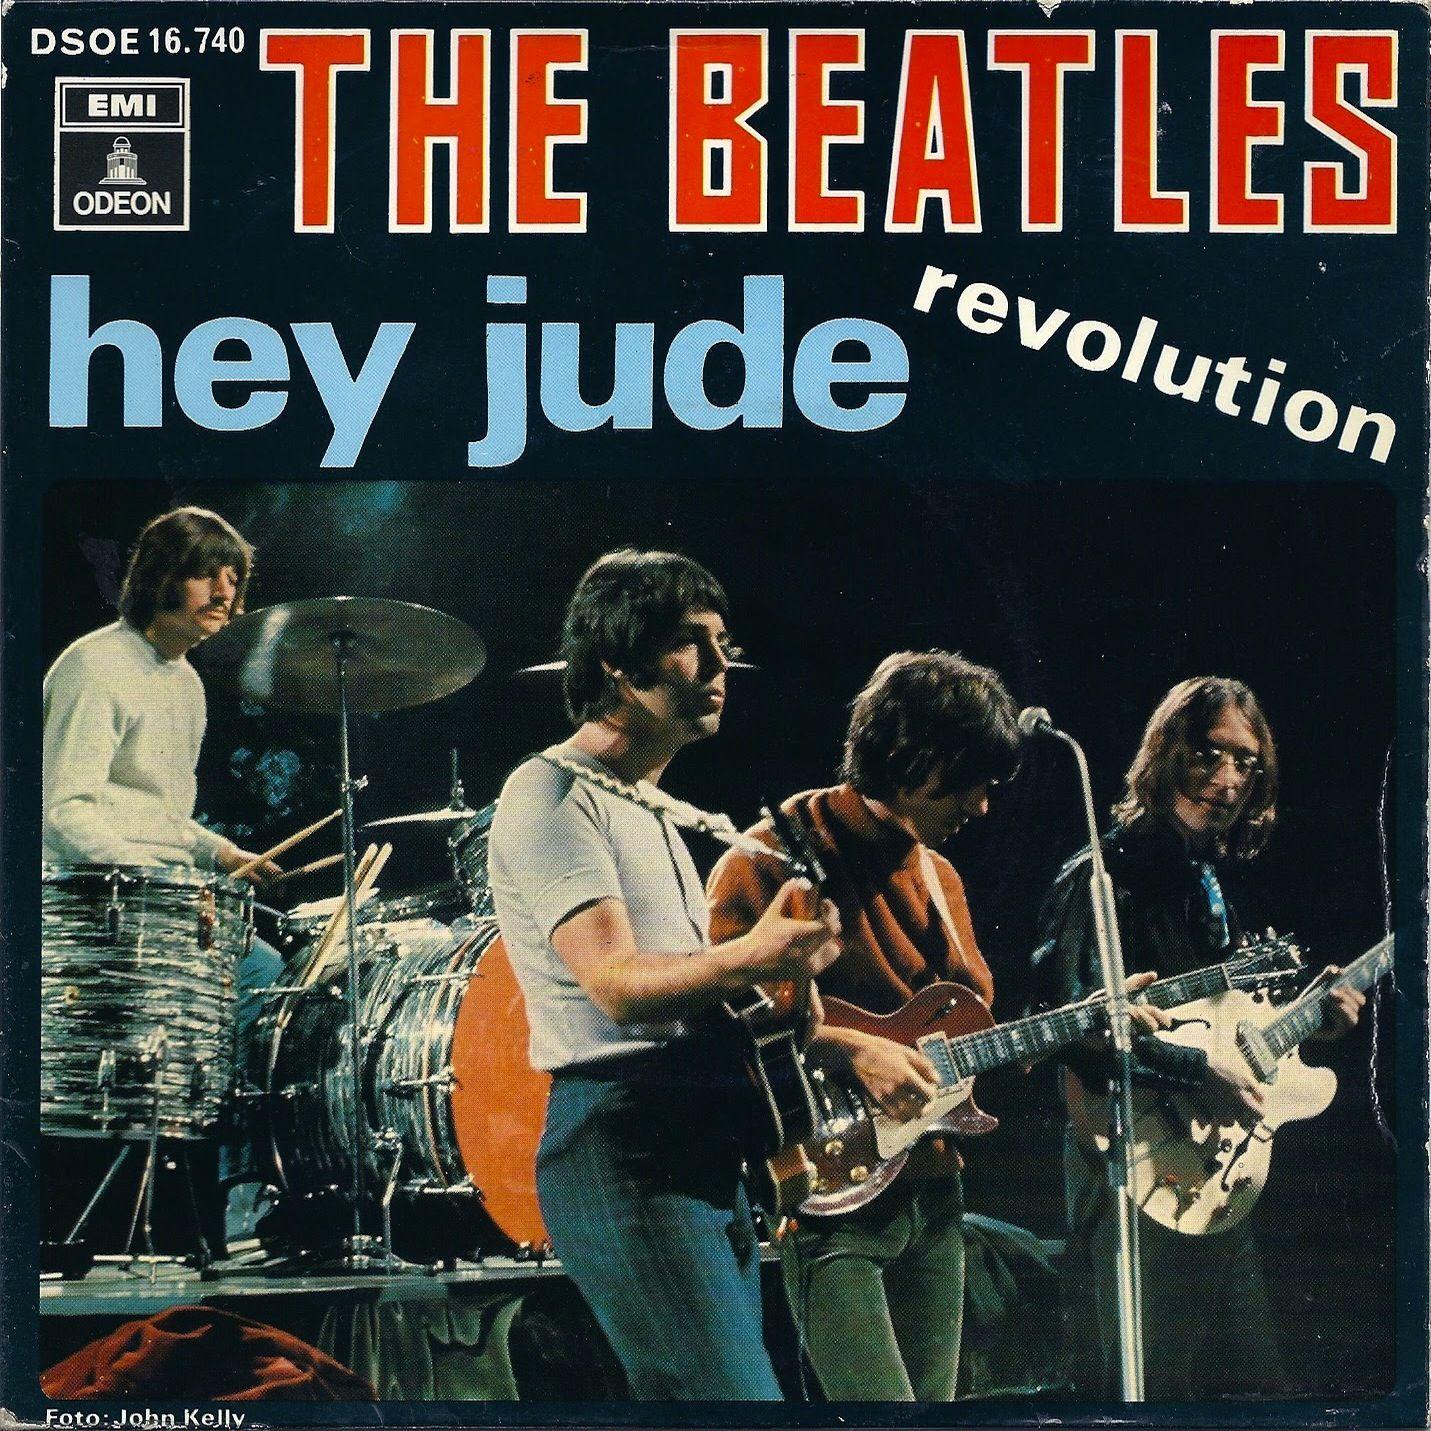 September 28, 1968 The Beatles started a nine week run